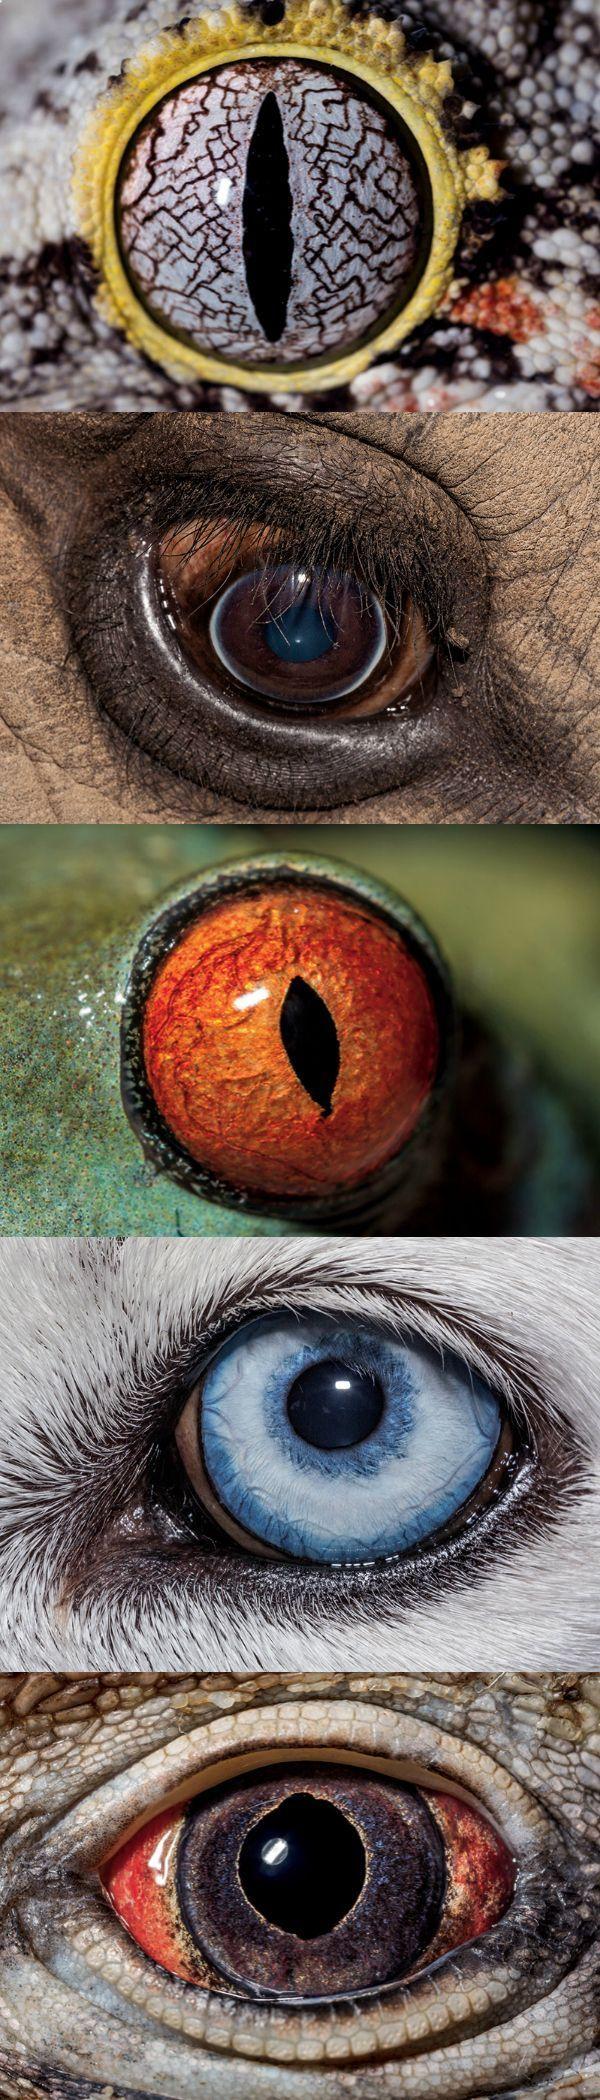 The strange yet beautiful science behind animal eyes | Ojos ...